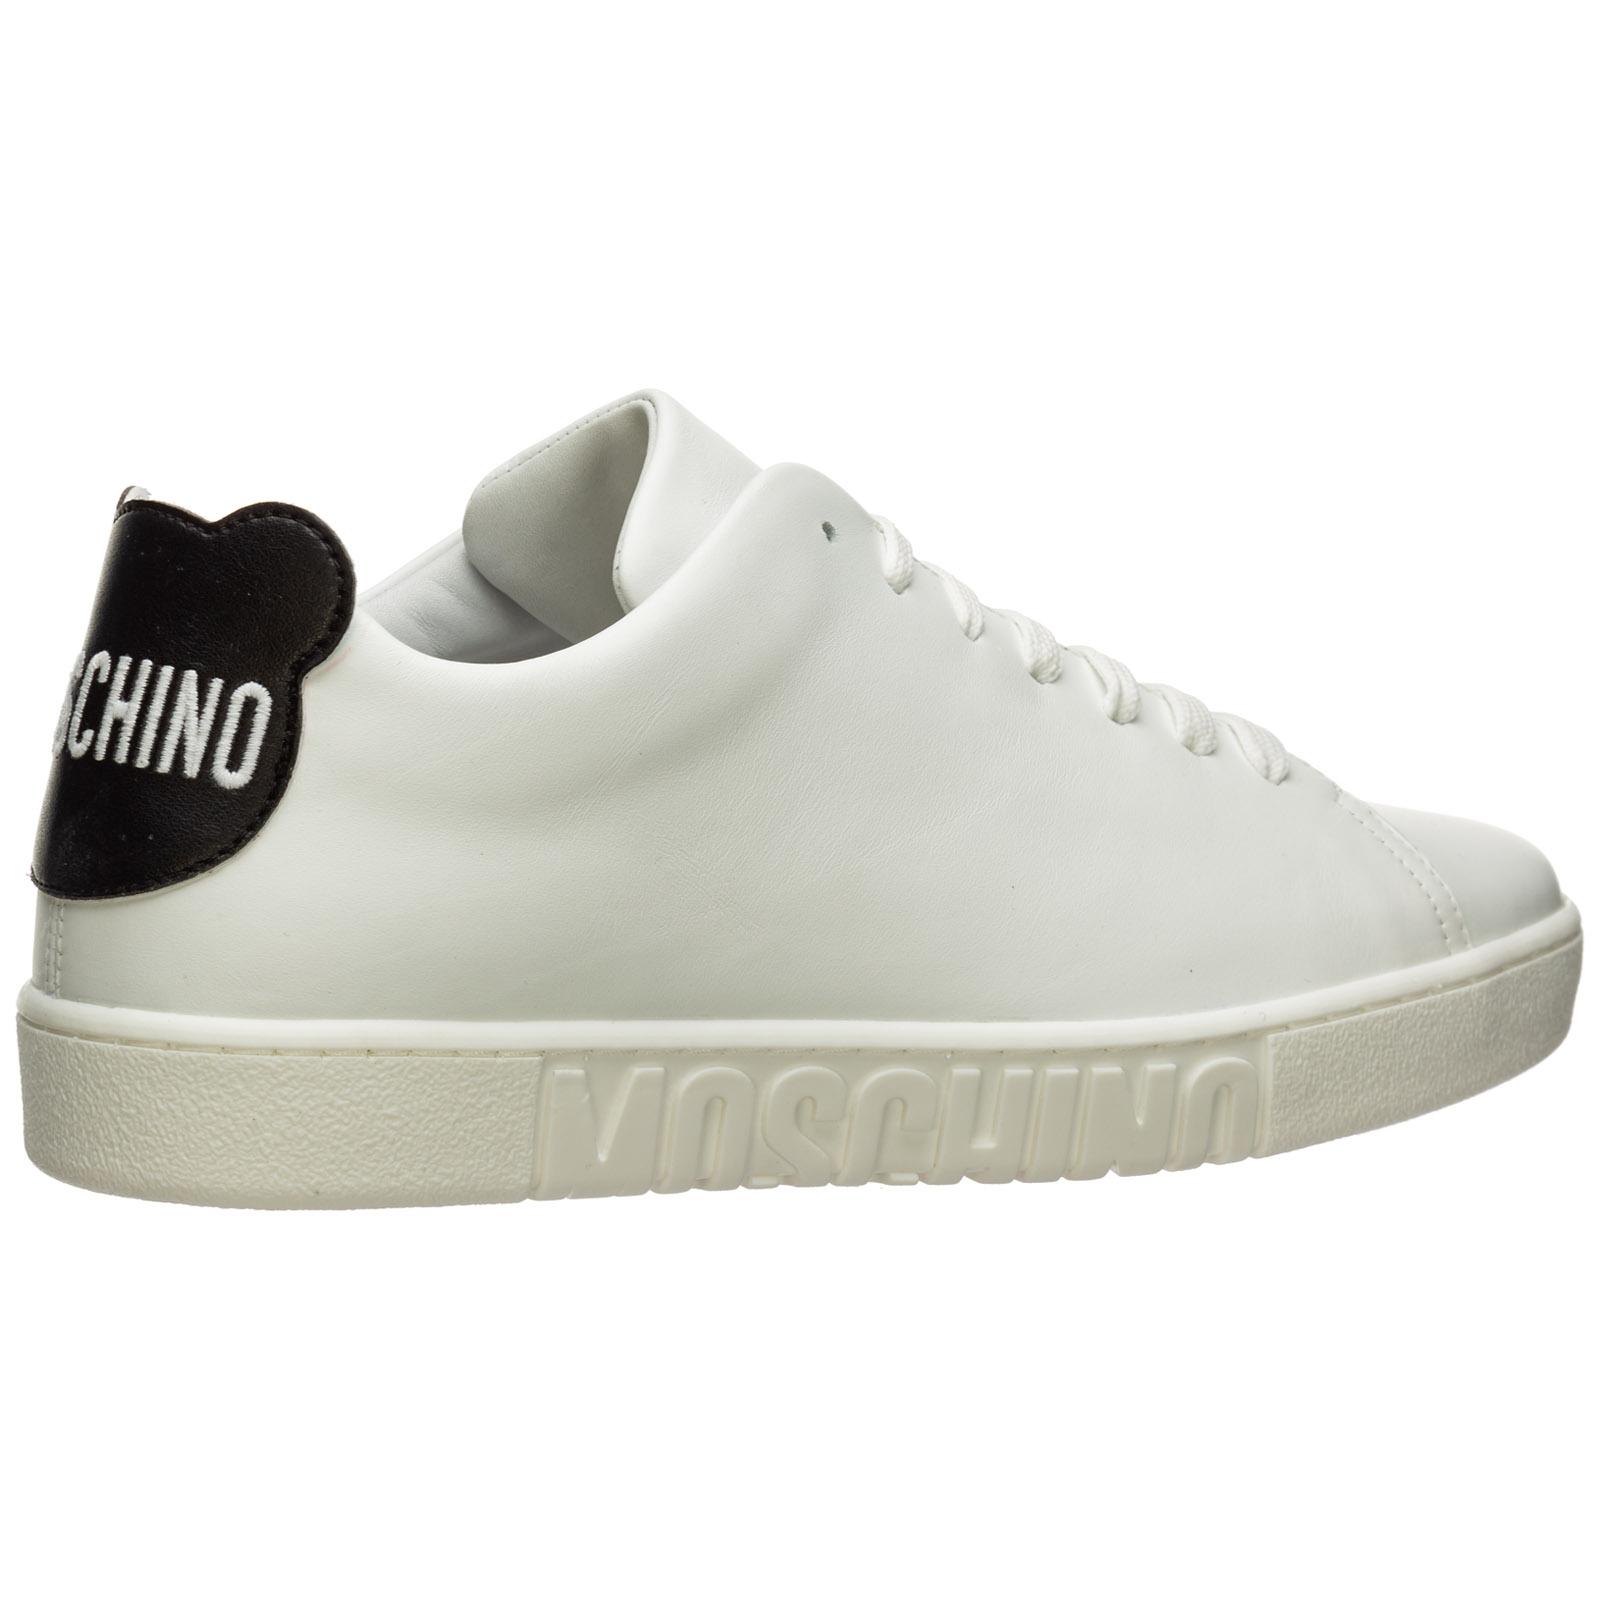 Sneakers Moschino teddy bear